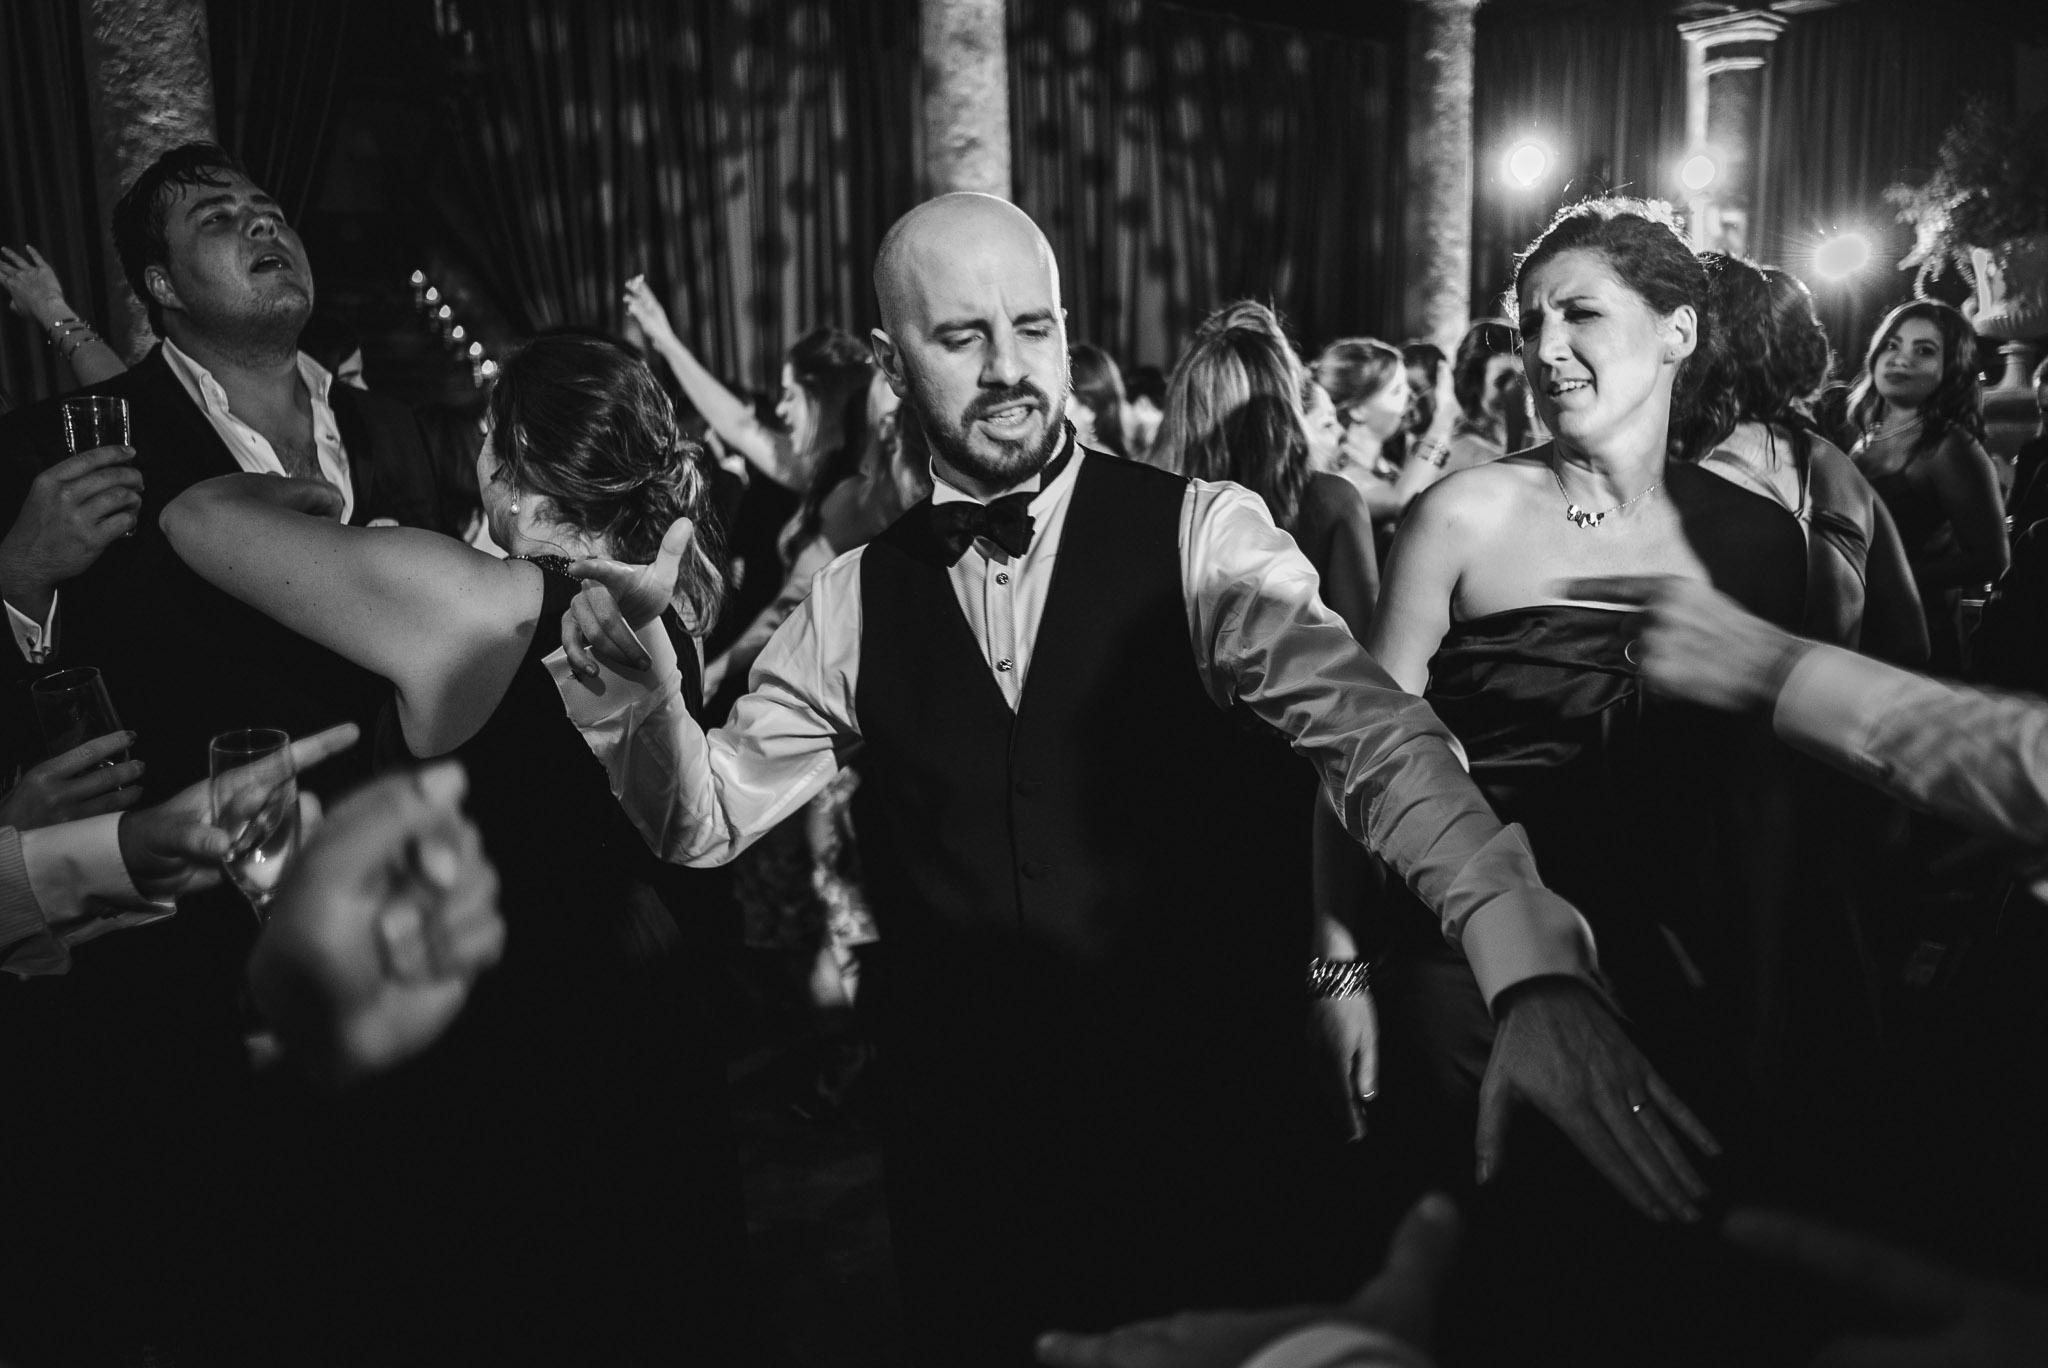 ©www.mauriziosolisbroca.com-20161002maurizio-solis-broca-mexico-canada-wedding-photographer20161002DSC09047-Edit.jpg